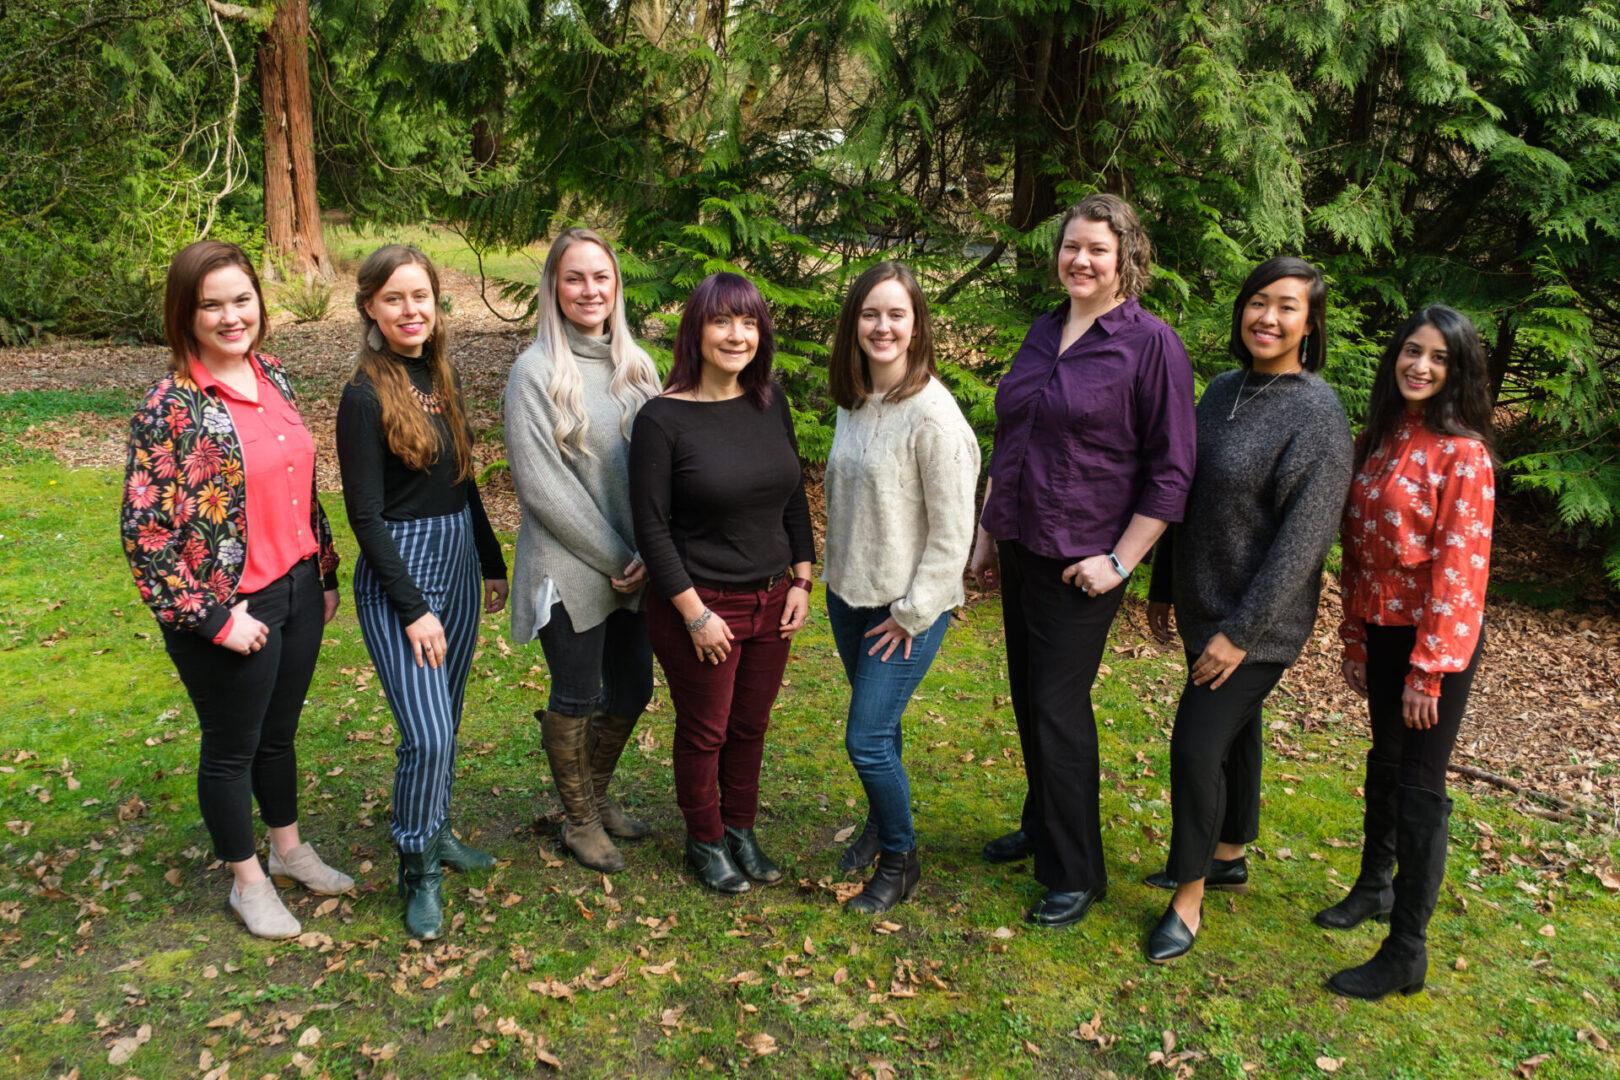 Fern Valley Natural Health Staff Photos at Washington Park Arboretum in Seattle, Washington, on March 27, 2021.